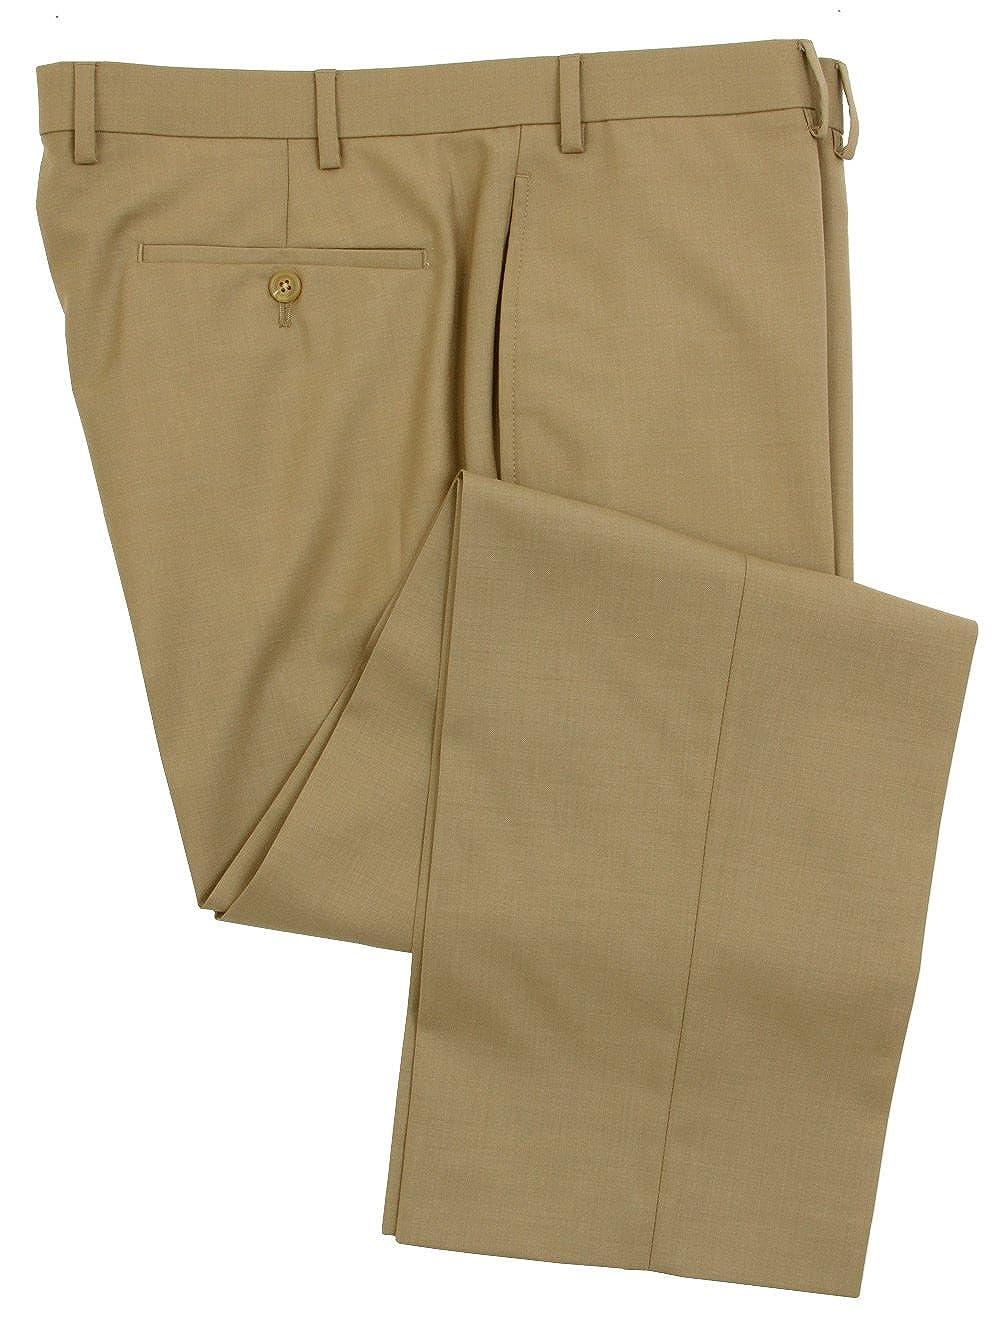 Ralph Lauren Wool Dress Pants For Men Classic Flat Front Style Trousers CAX0002